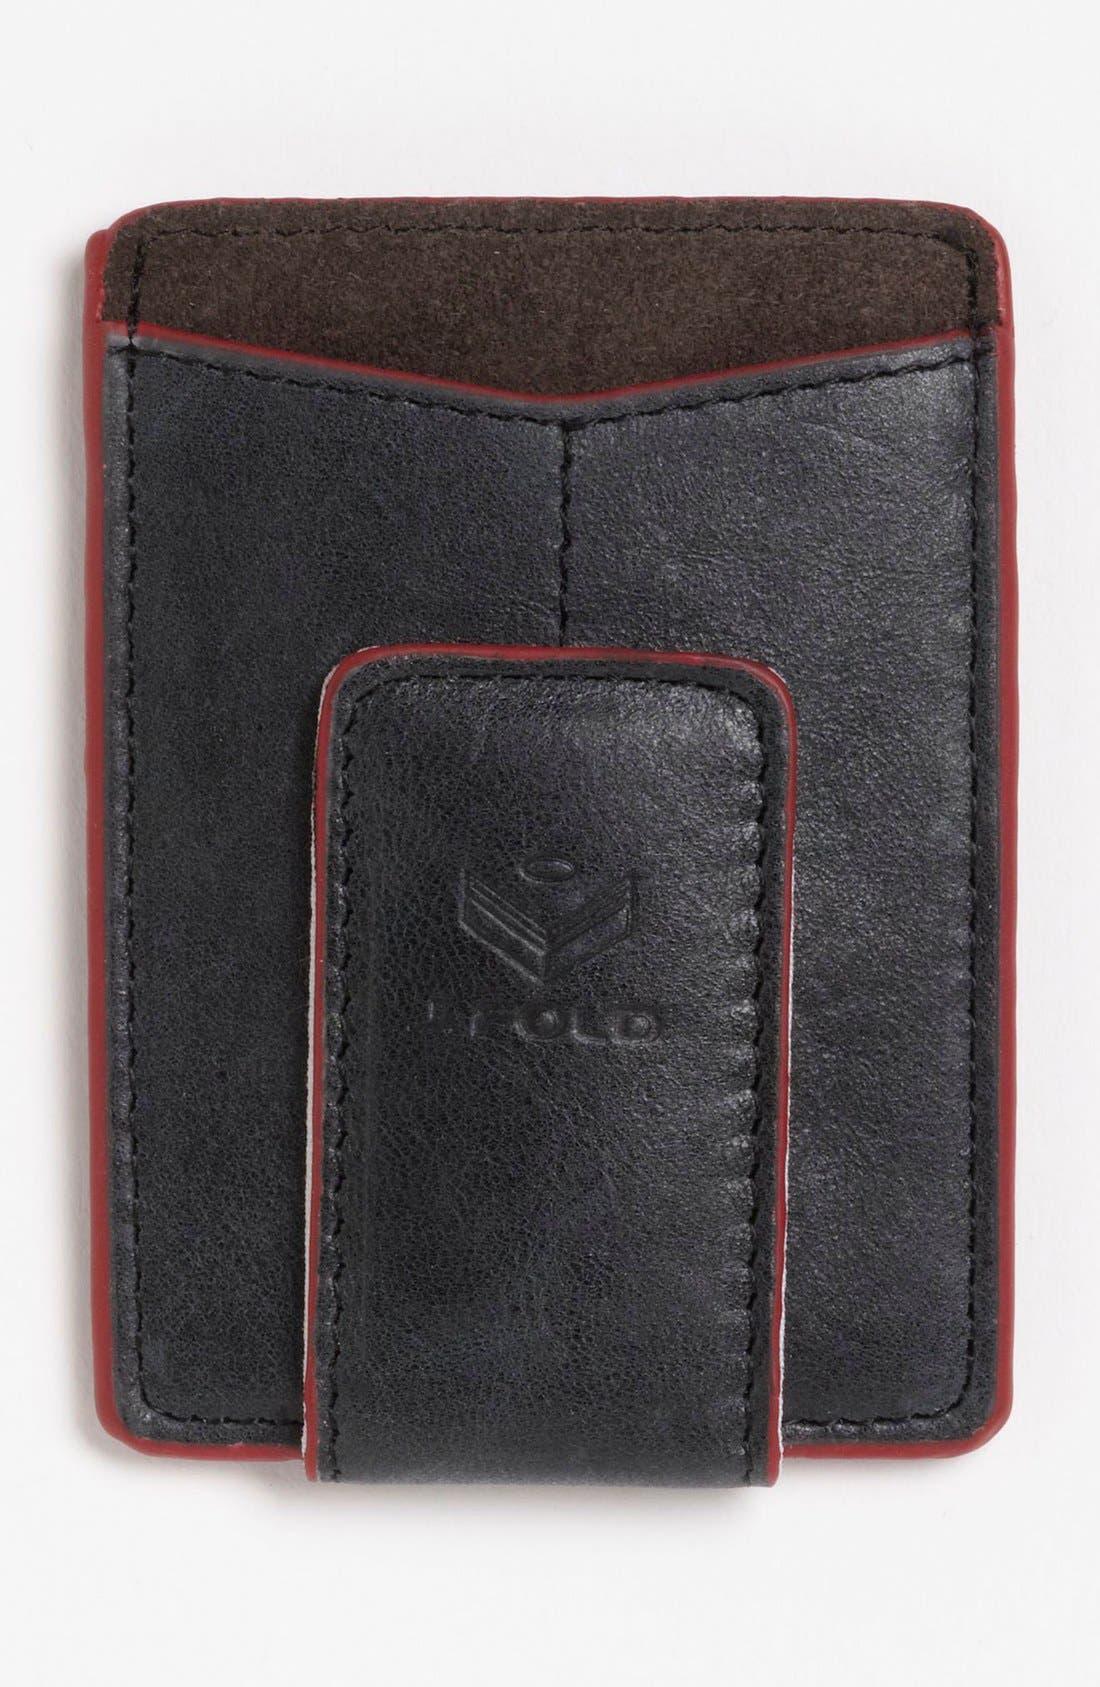 Alternate Image 1 Selected - J. Fold 'Smokestack' Money Clip Wallet